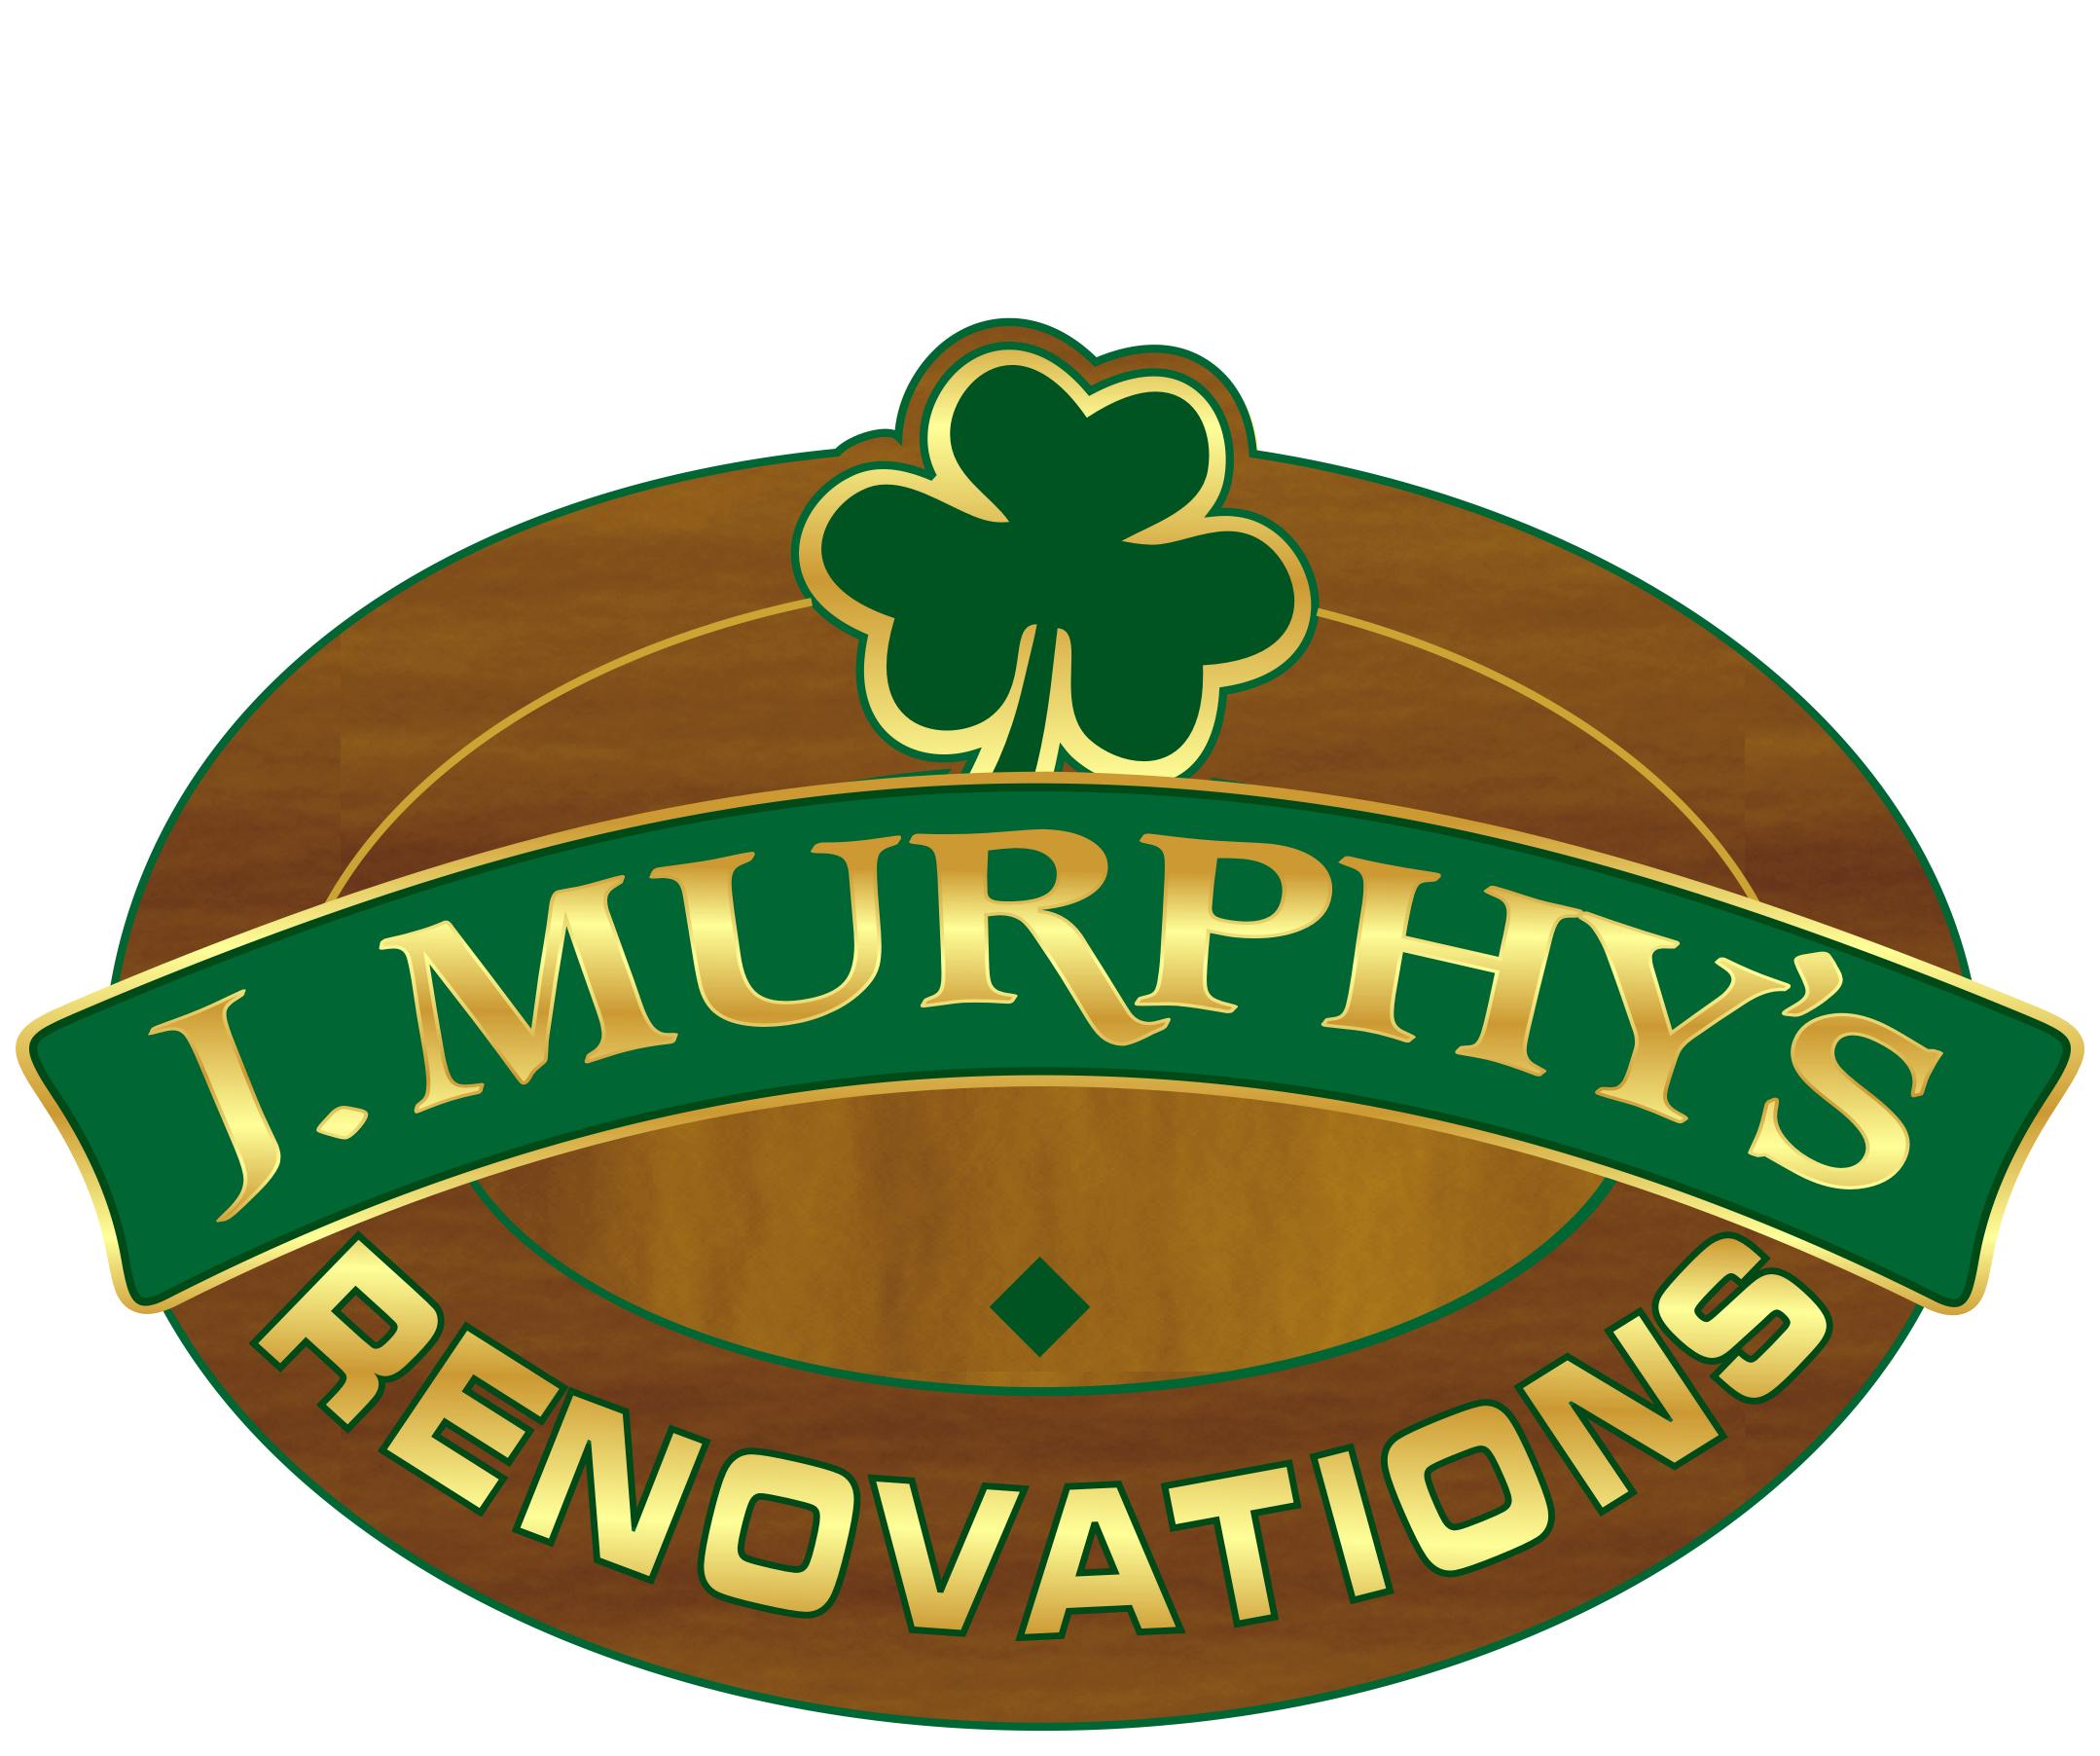 Logo Design by Robert Morgan - Entry No. 73 in the Logo Design Contest J. Murphy's Renovations Logo Design.